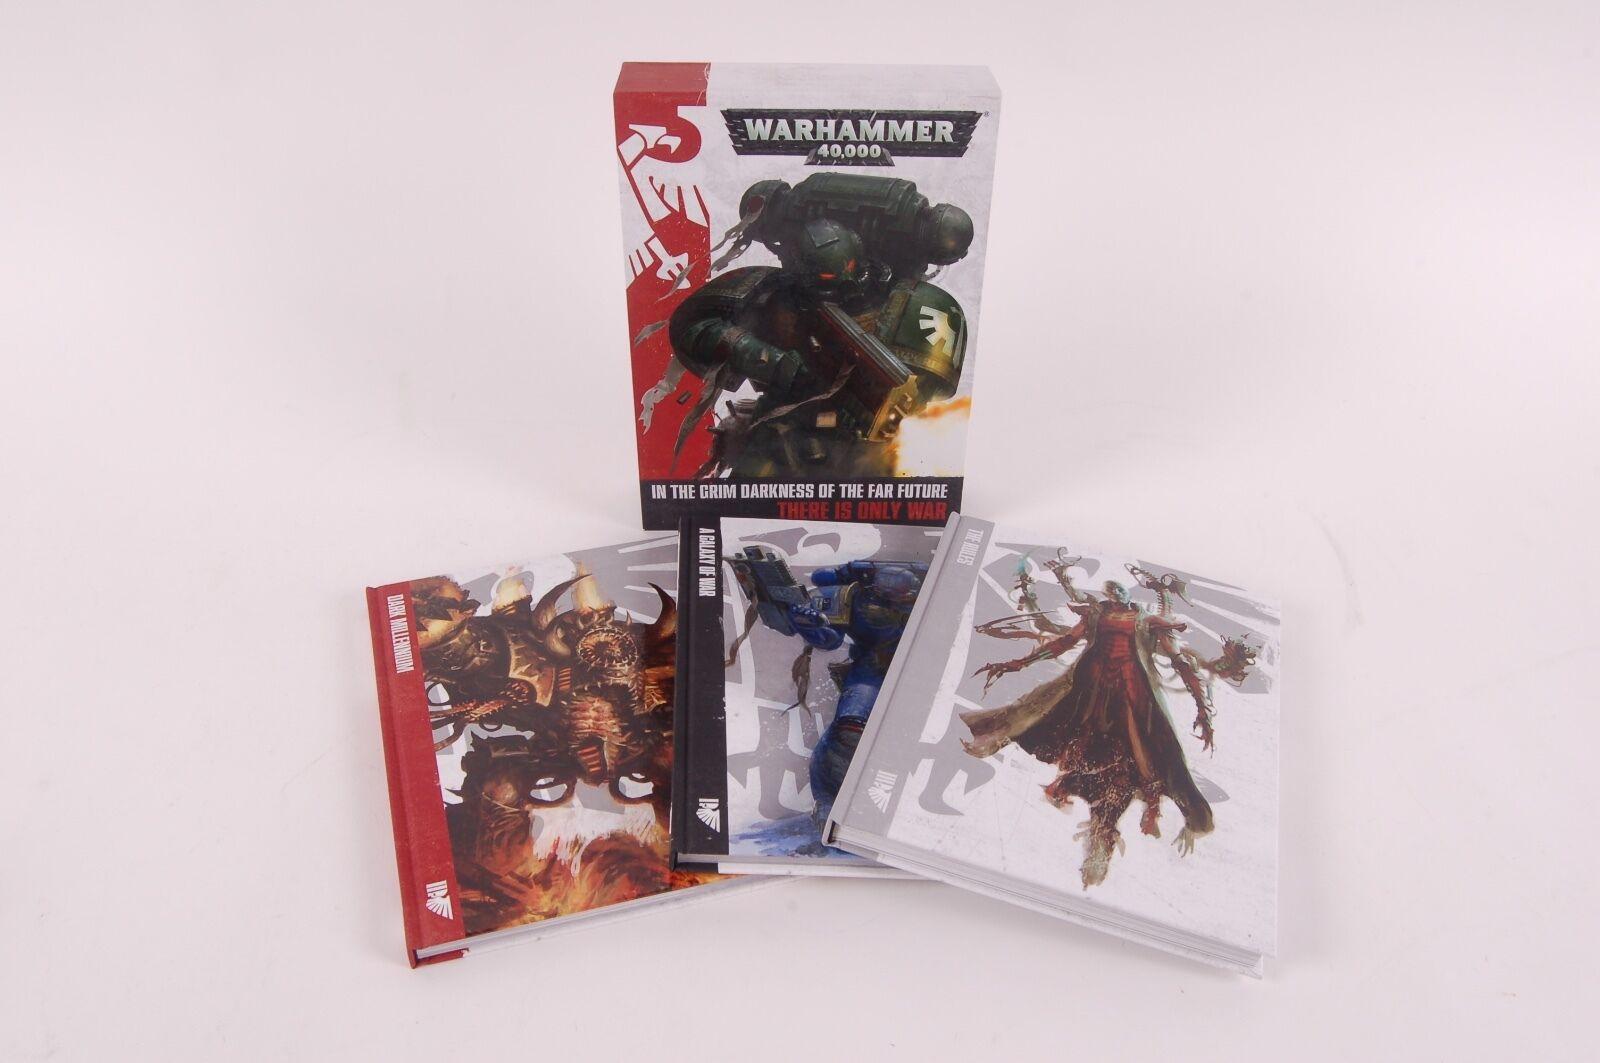 Warhammer 40k 3 Book Hardcover Rulebook Set Rules Galaxy of War Dark Millennium